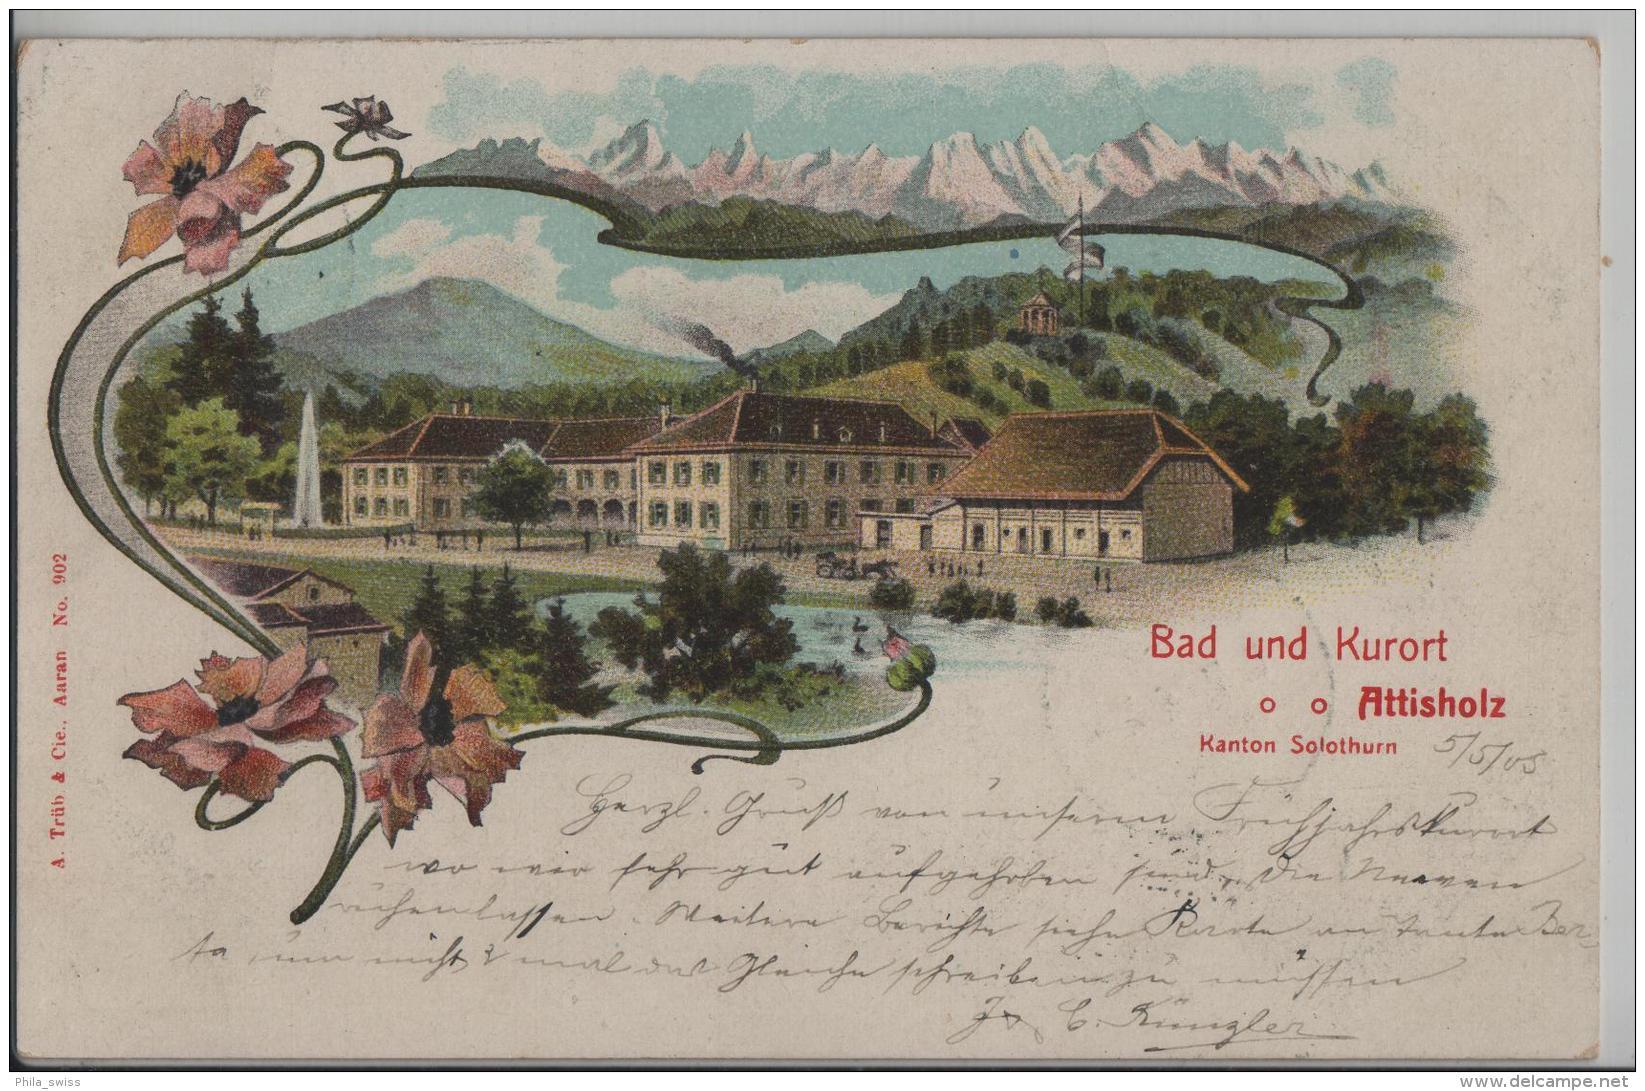 Bad Und Kurort Attisholz Kanton Solothurn - Litho A. Trüb & Cie. No. 902 (Schnappszahl 5.5.05) - SO Soleure